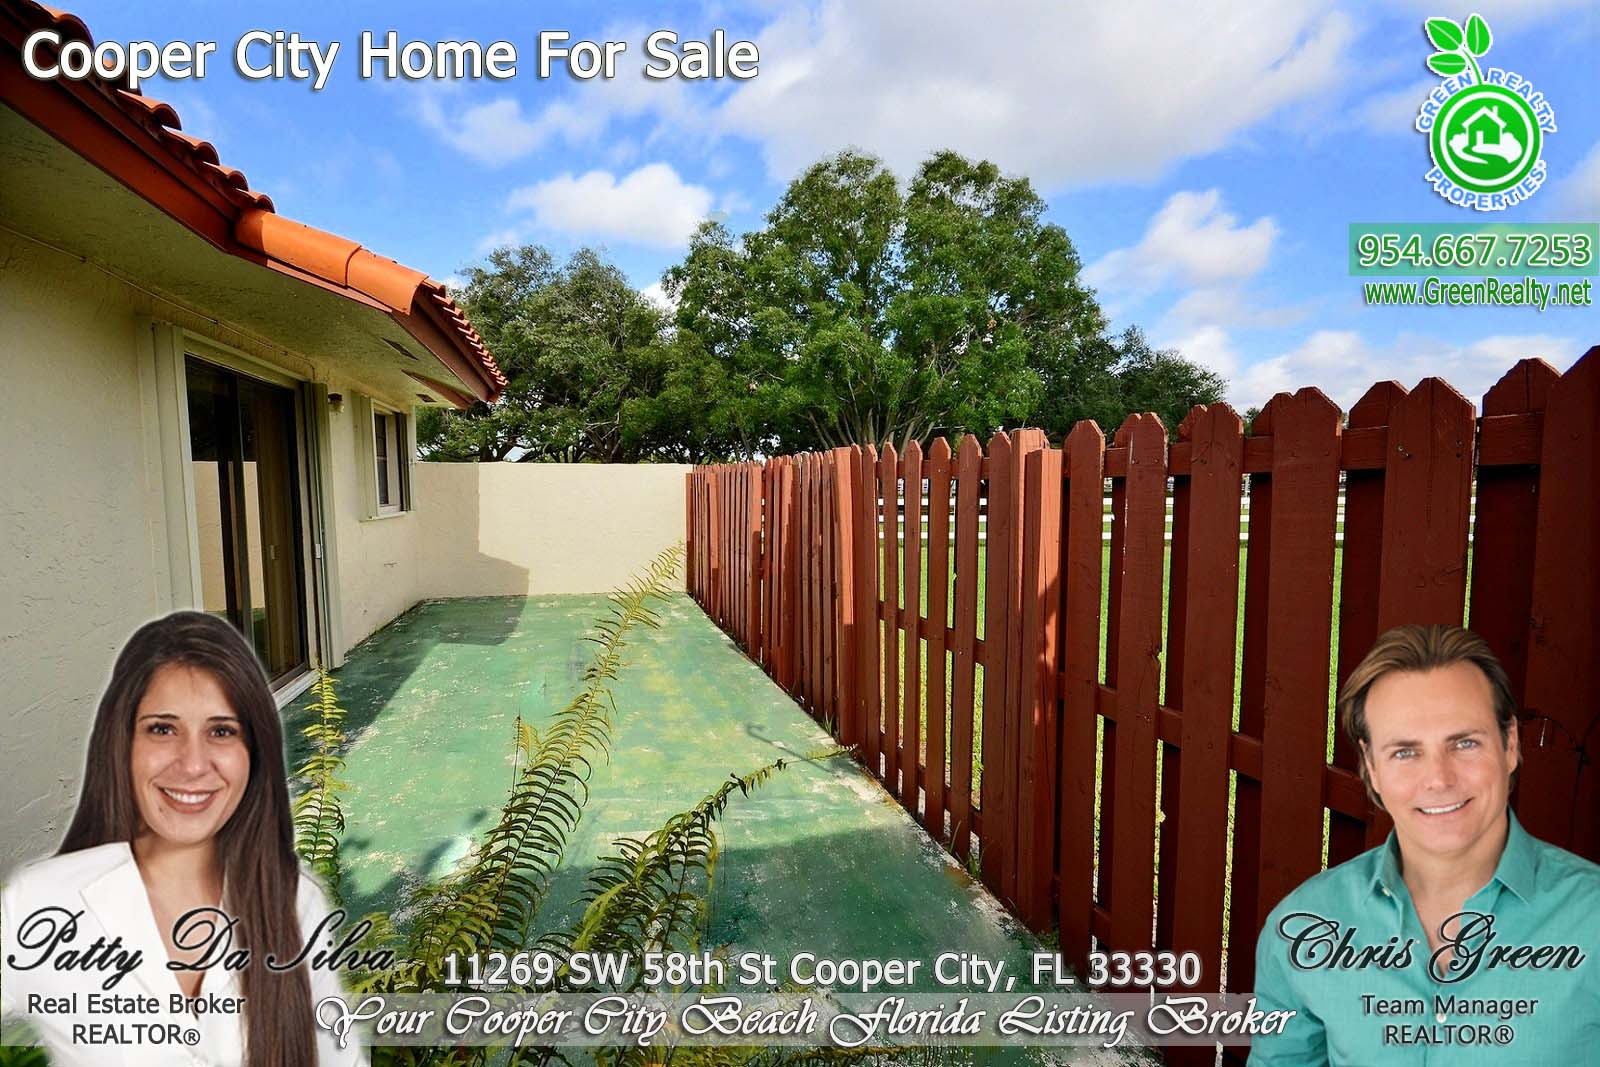 21 Cooper City Real Estate - Villas (15)